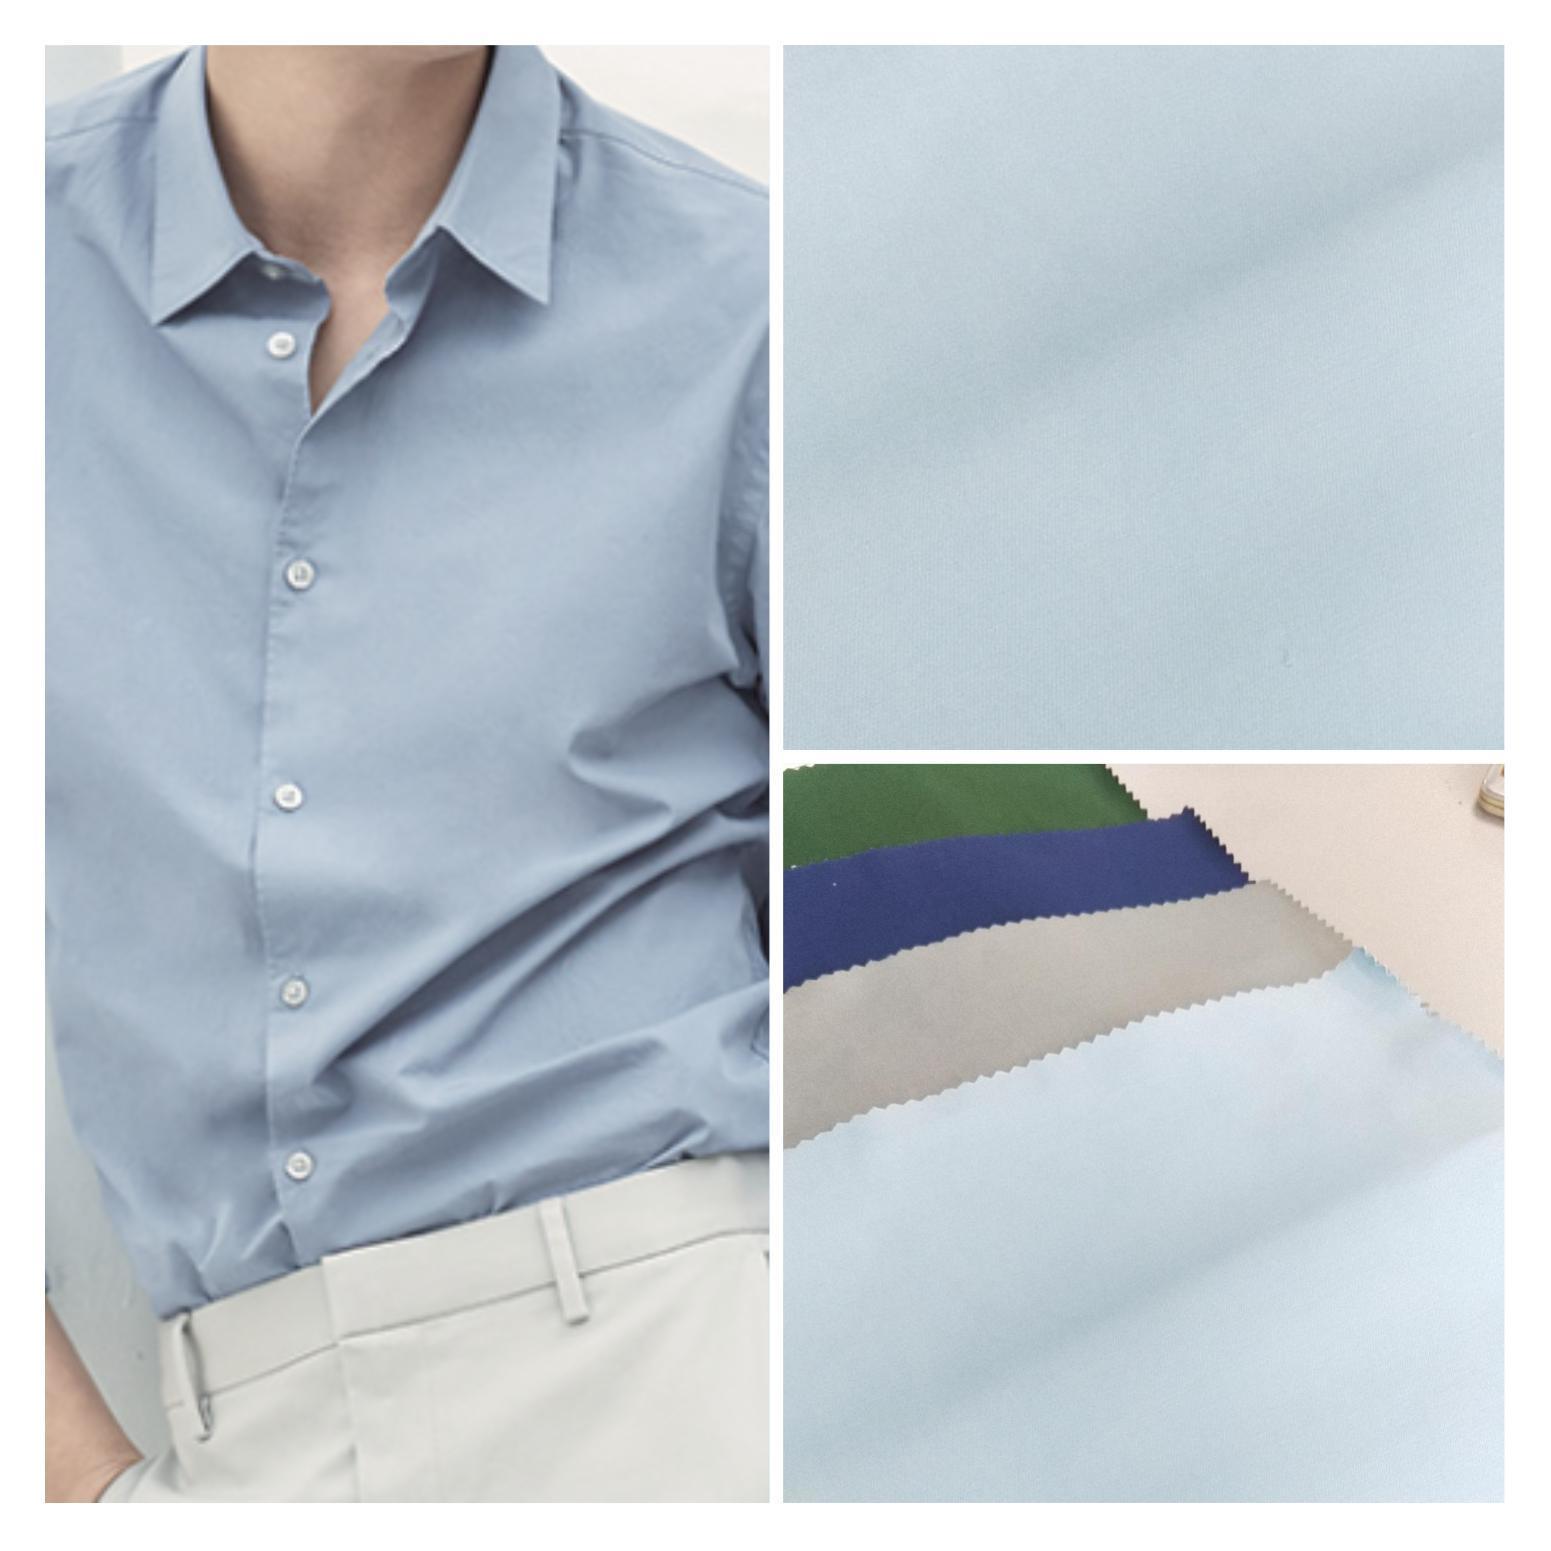 China Cotton Poplin Shirt Fabric   China Cotton Shirt Fabric and 20 ...